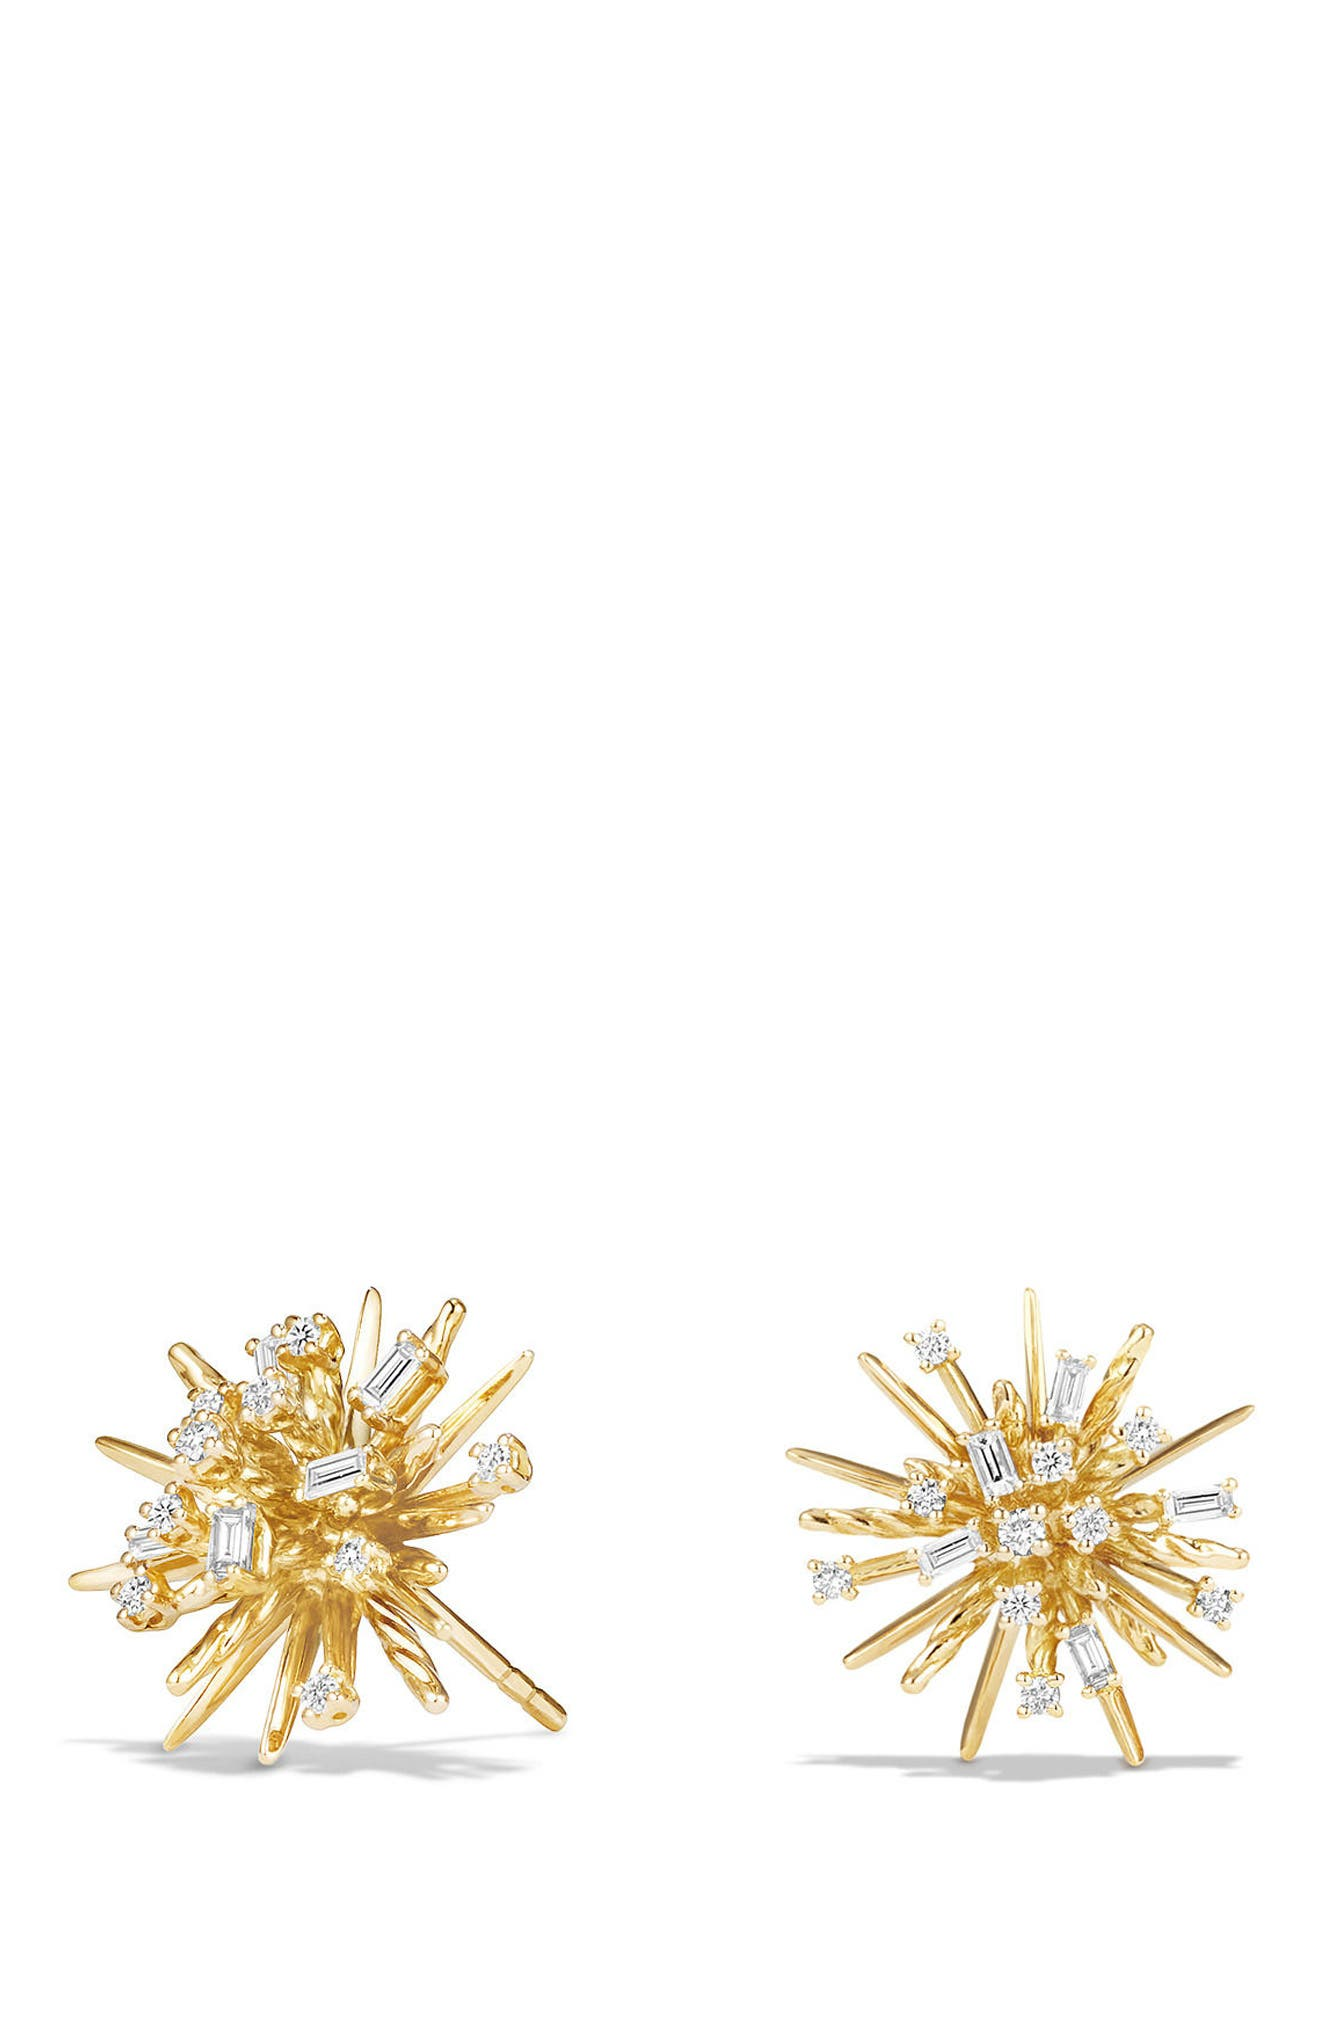 Main Image - David Yurman Supernova Stud Earrings with Diamonds in 18K Gold